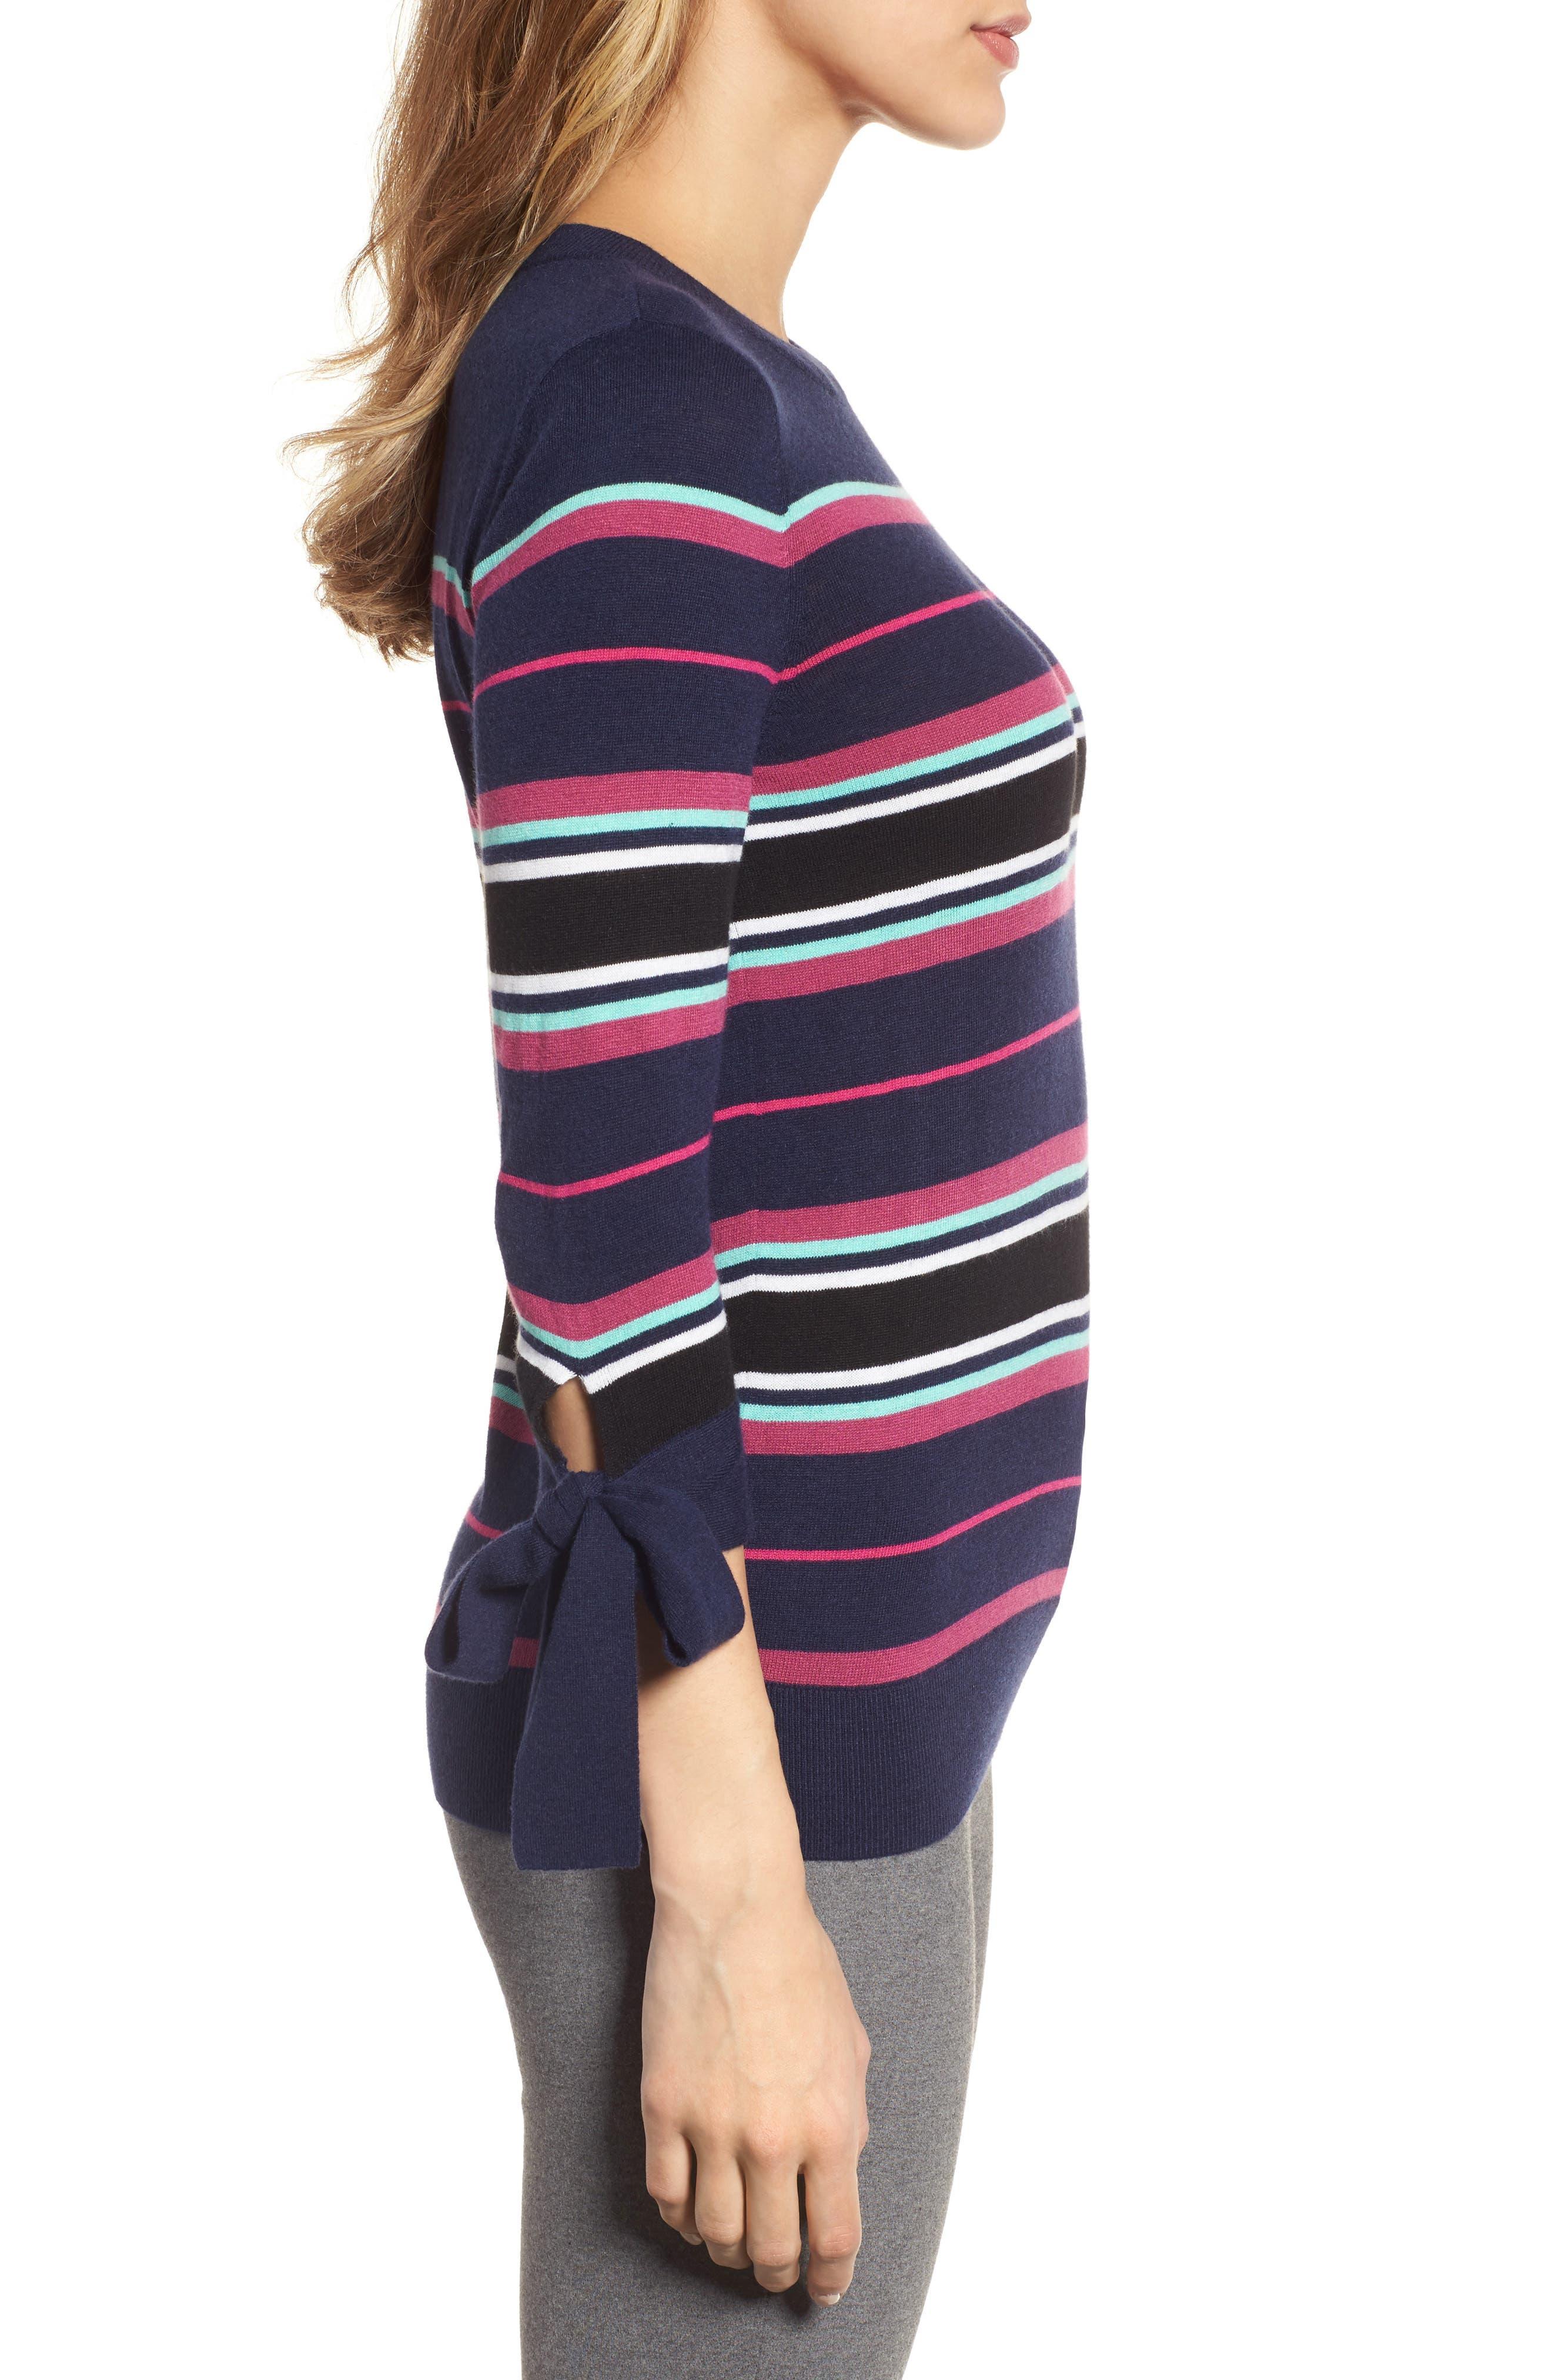 Tie Sleeve Crewneck Sweater,                             Alternate thumbnail 3, color,                             Navy/ Pink Multi Stripe